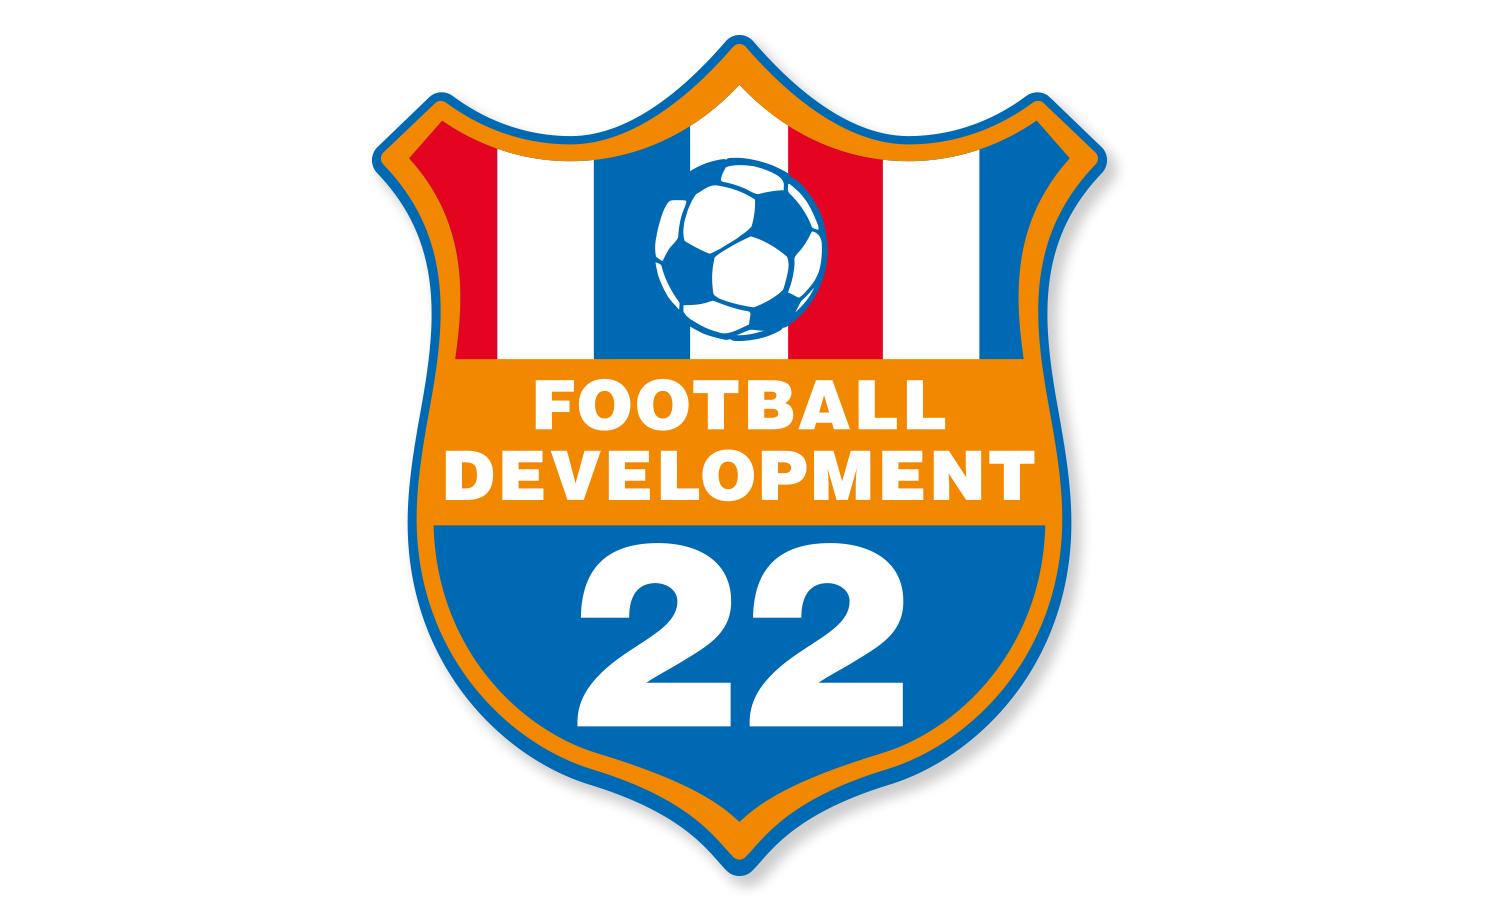 Footbal_22